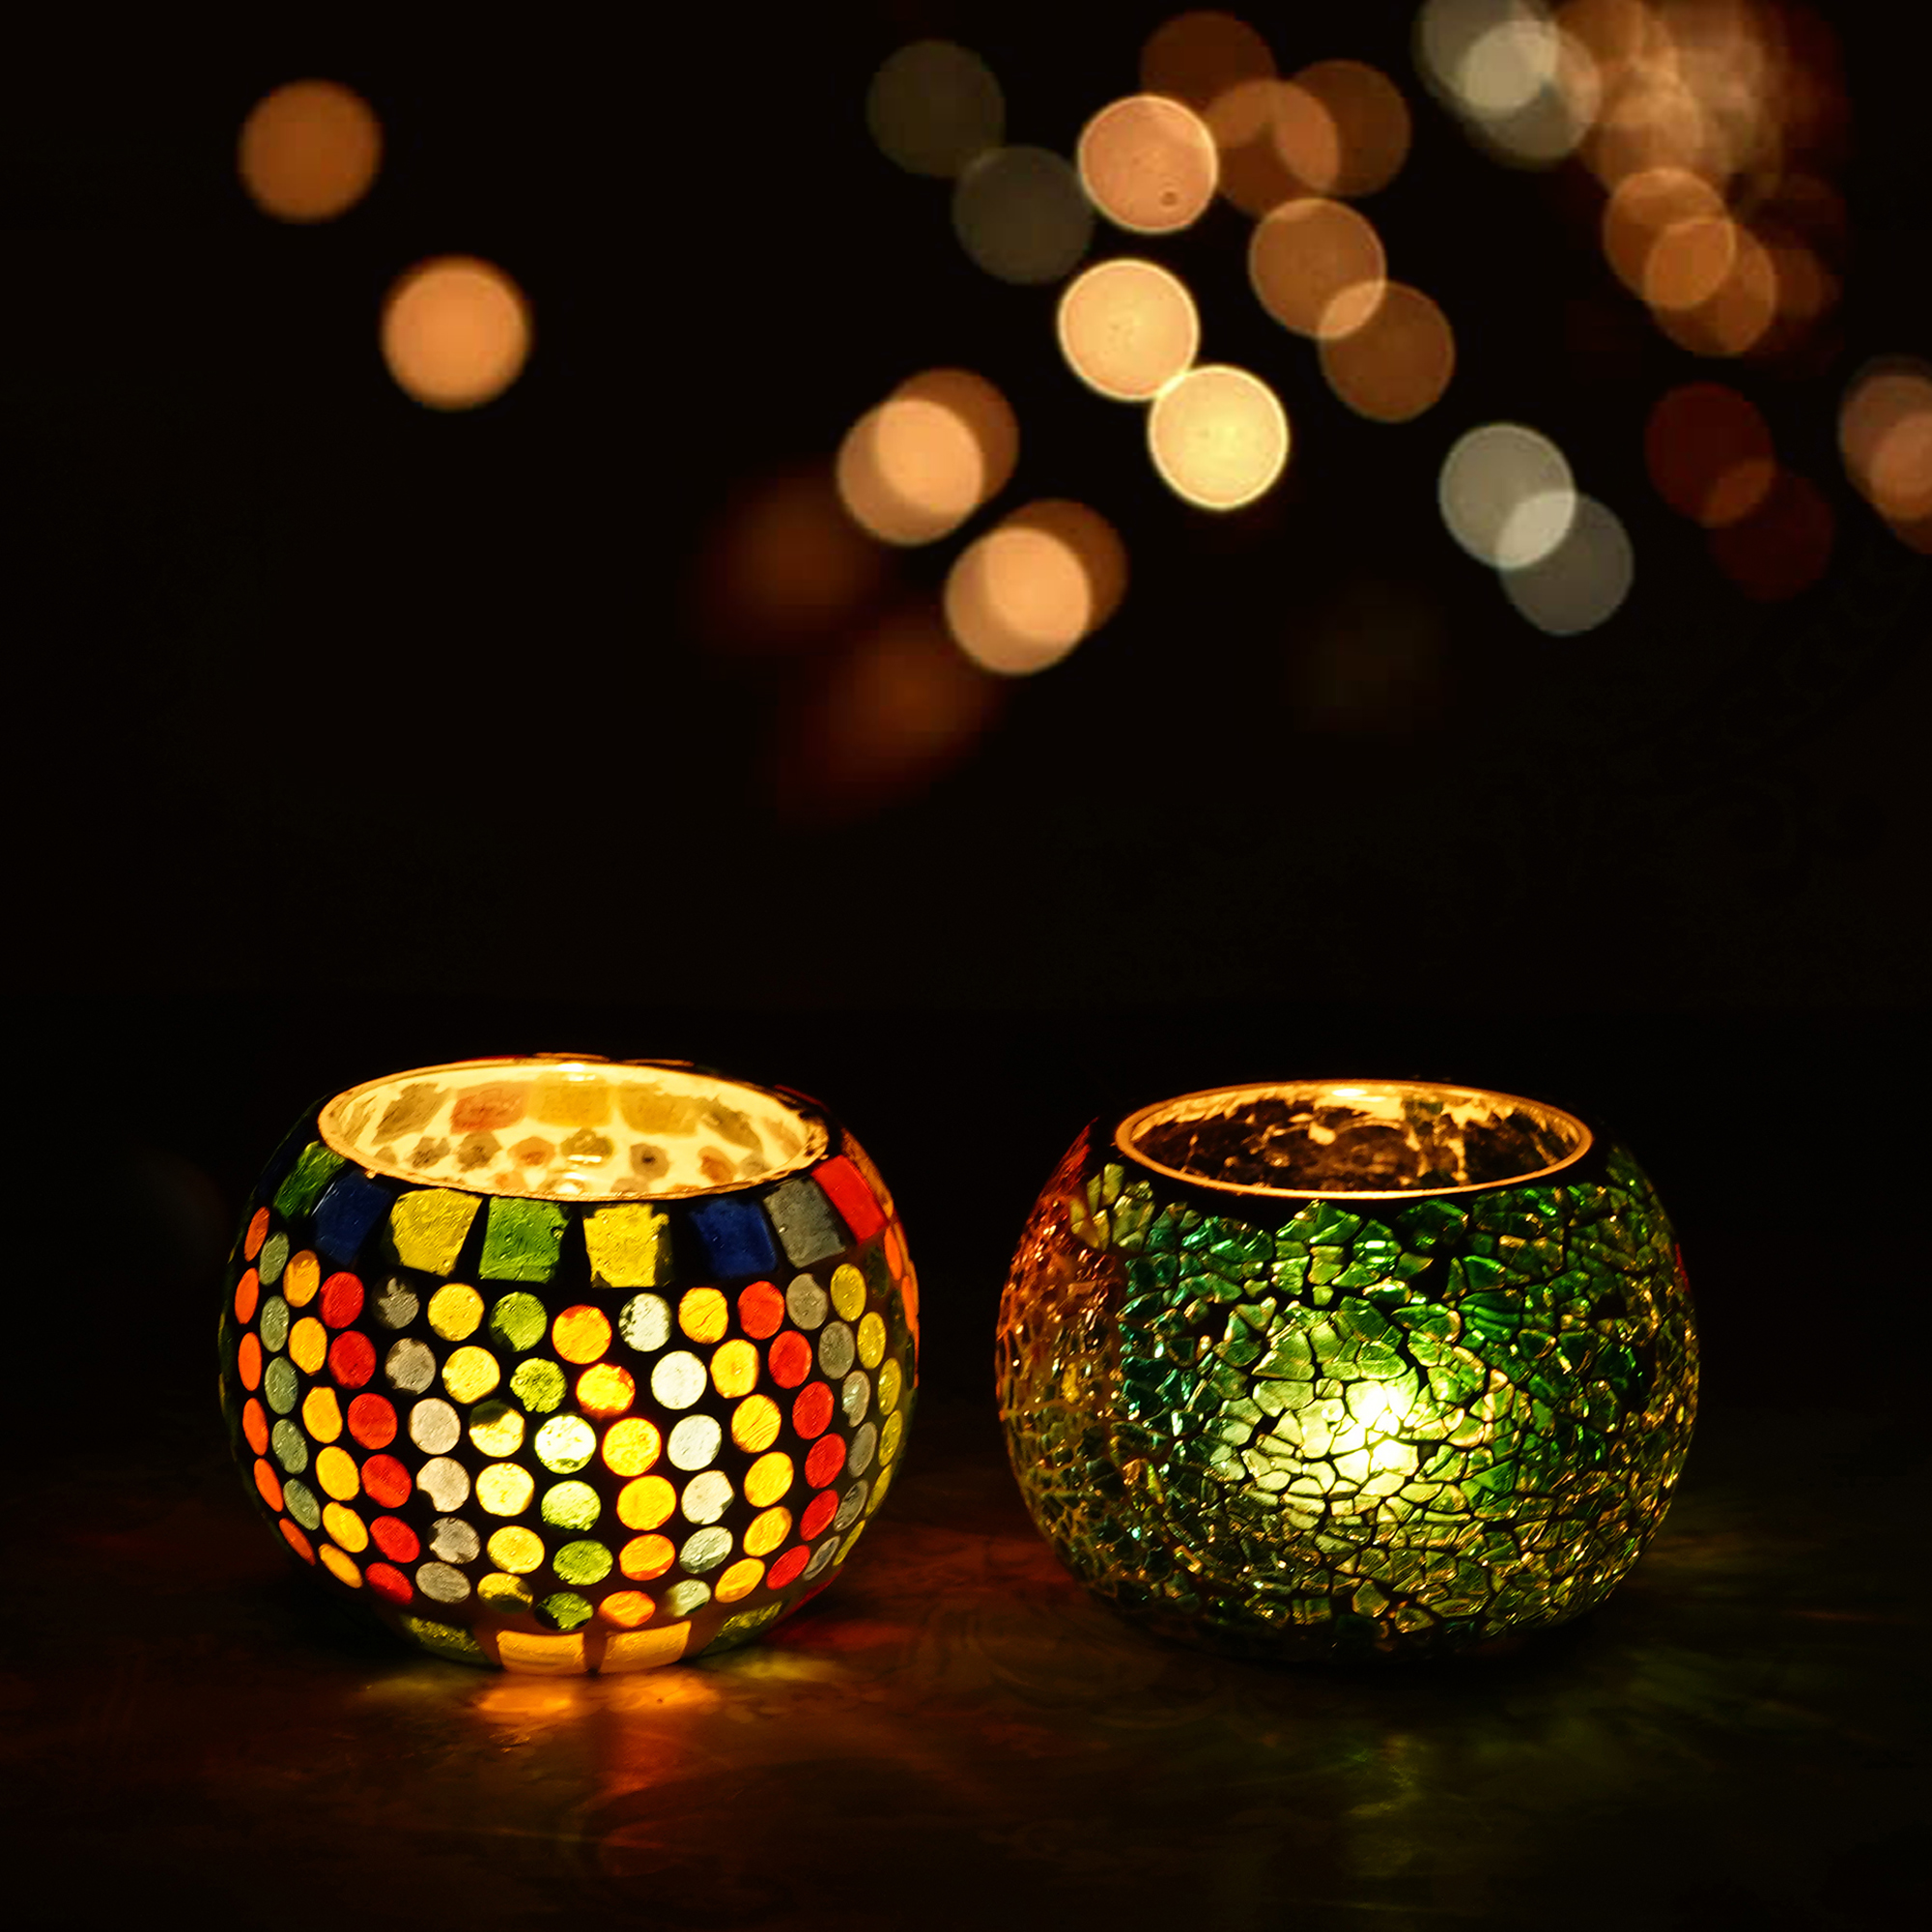 Set of 2 Mosiac Glass Decorative Tea Light Holder/Diya Indian Home Decor